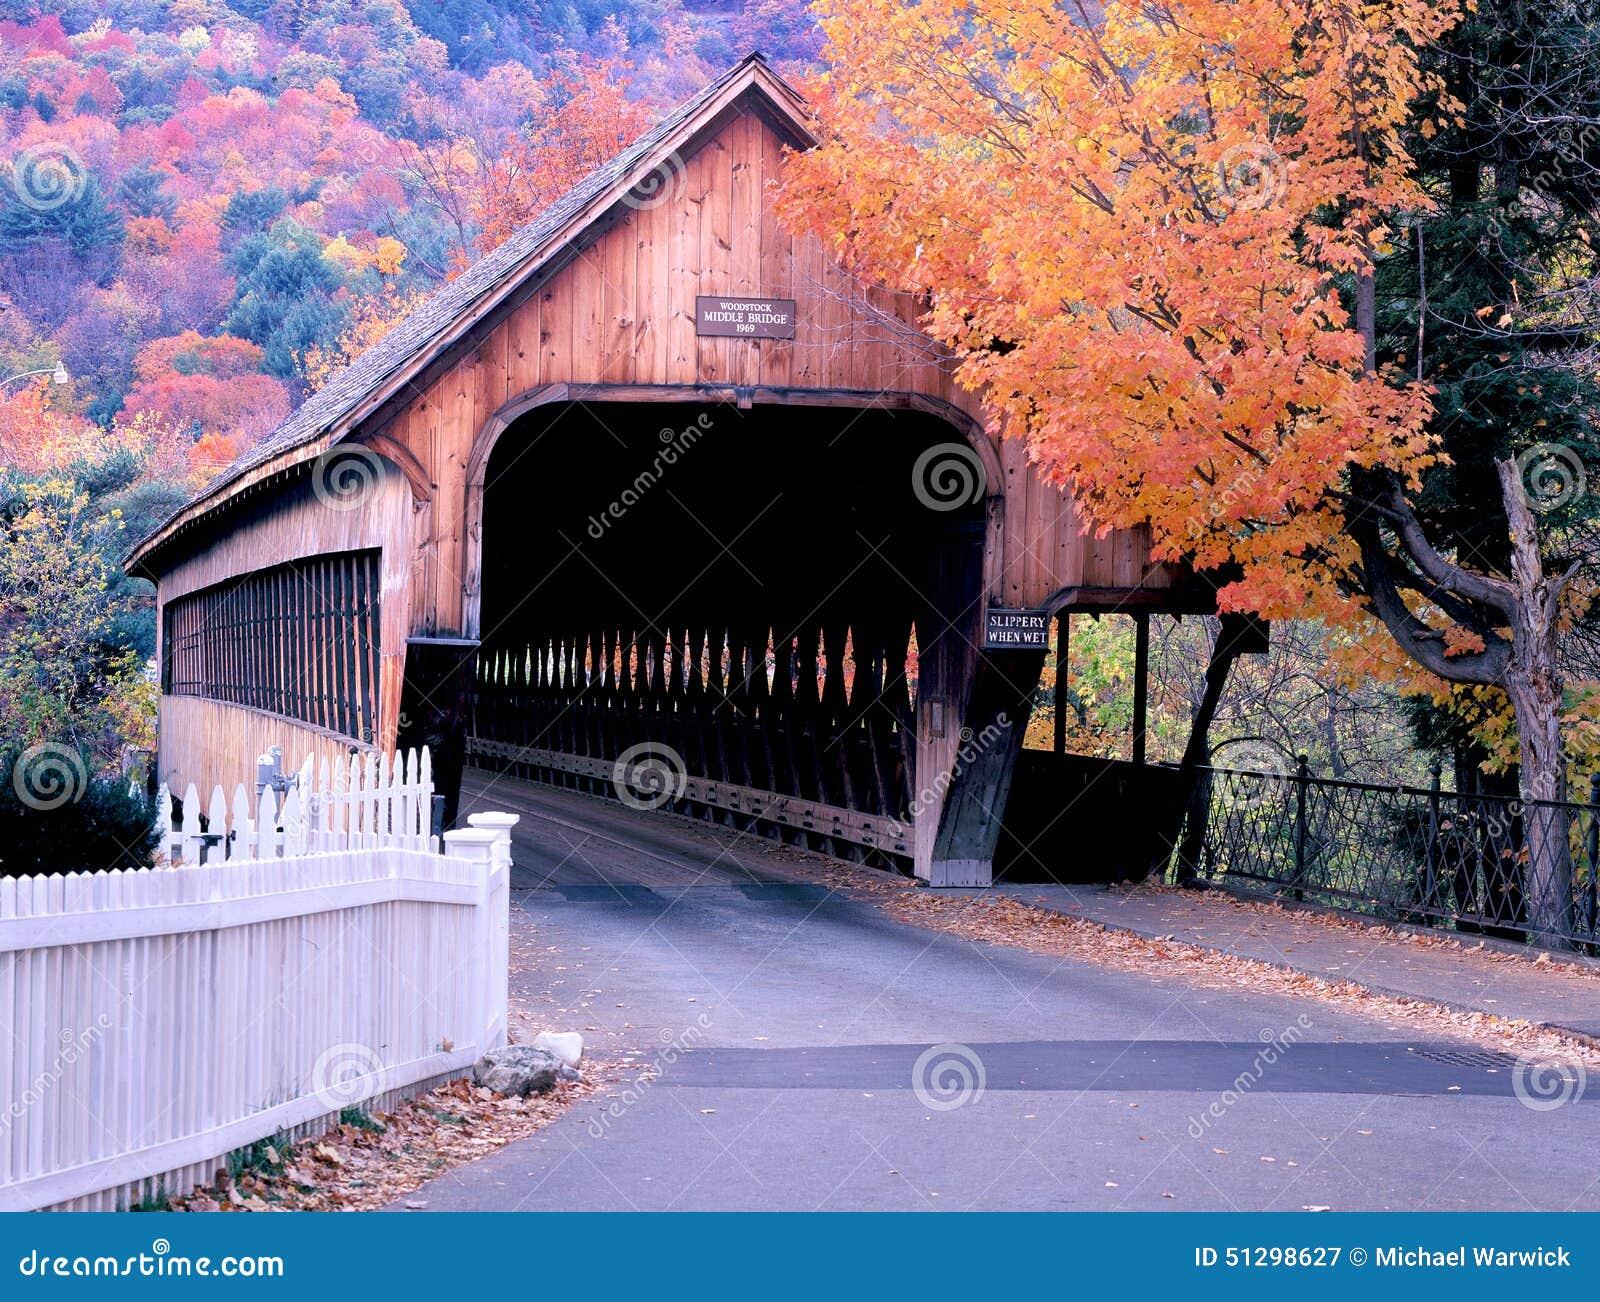 Vermont Woodstock Covered Bridge in Autumn